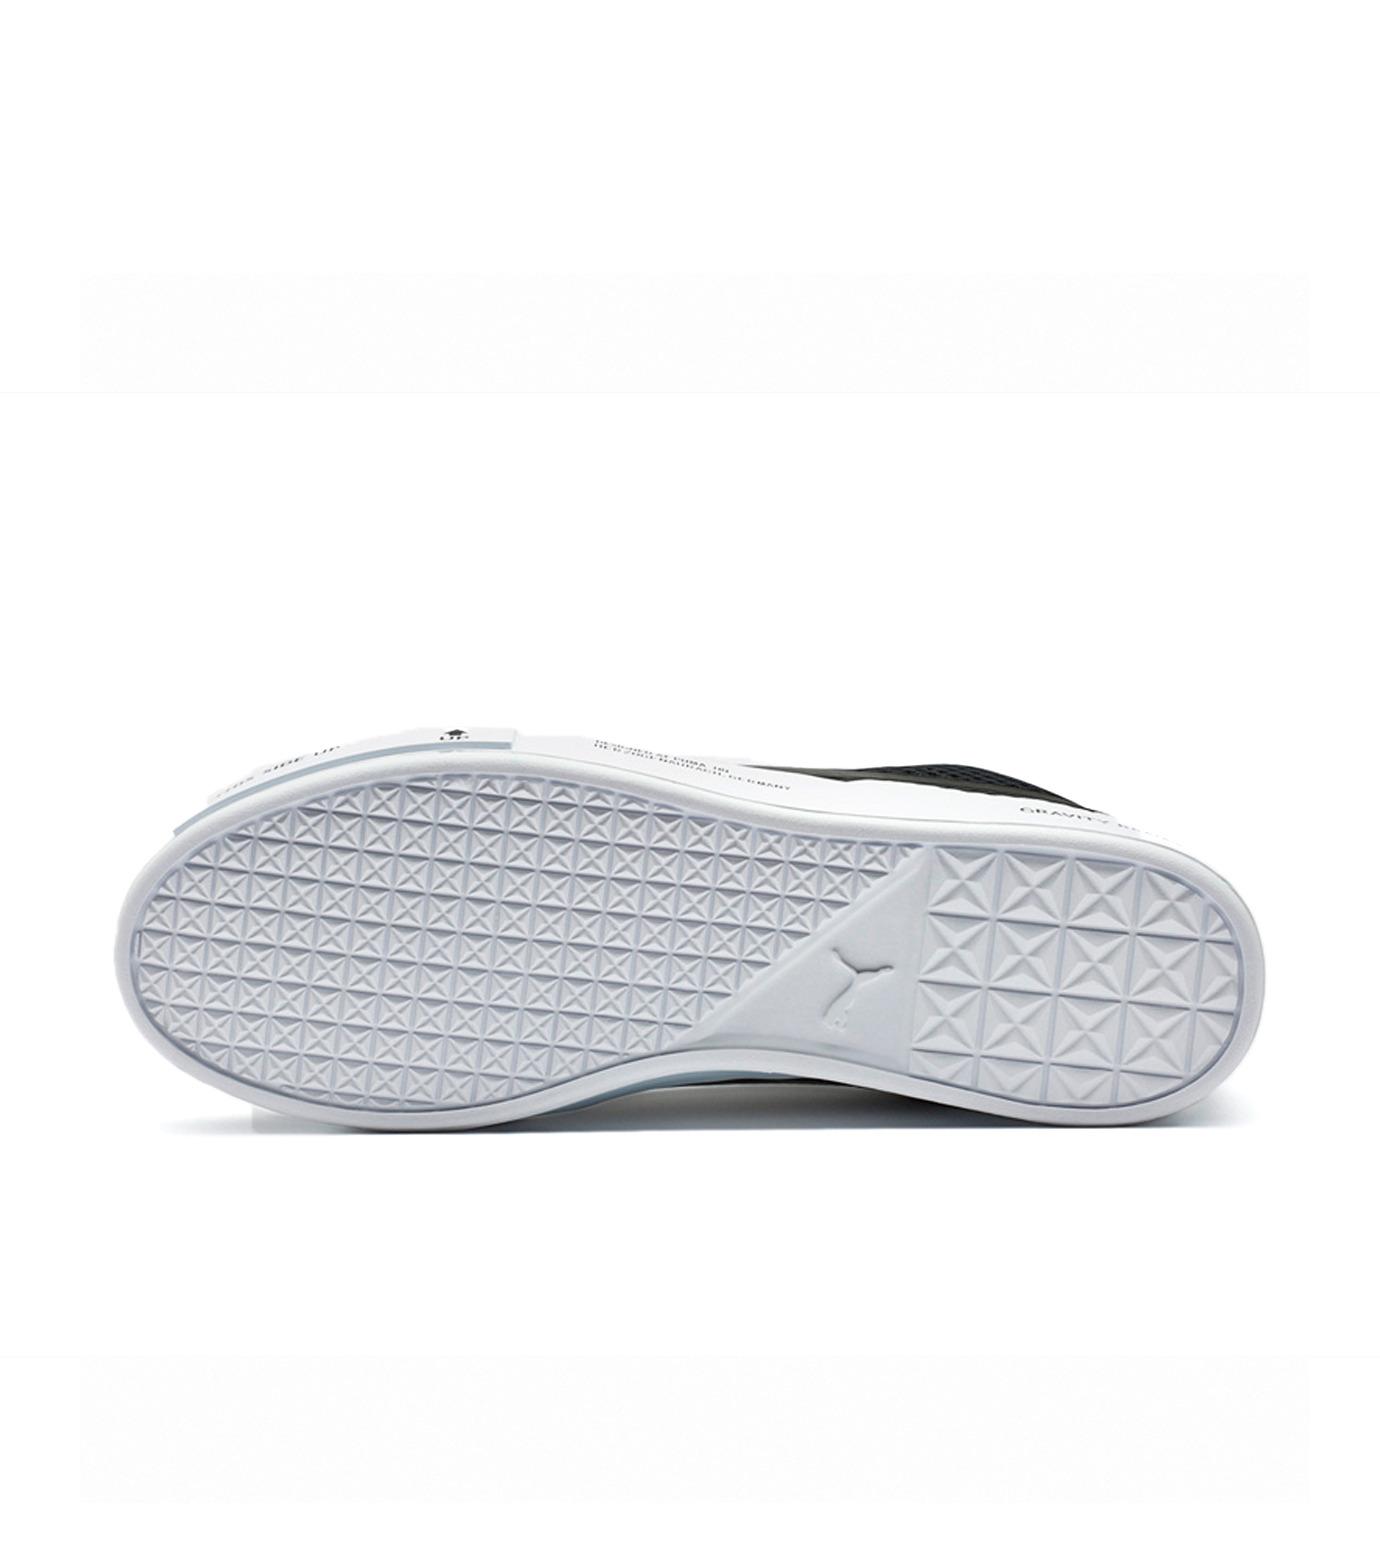 PUMA(プーマ)のCOURT PLAY SLIPON X UEG-WHITE(シューズ/shoes)-361637-4 拡大詳細画像2